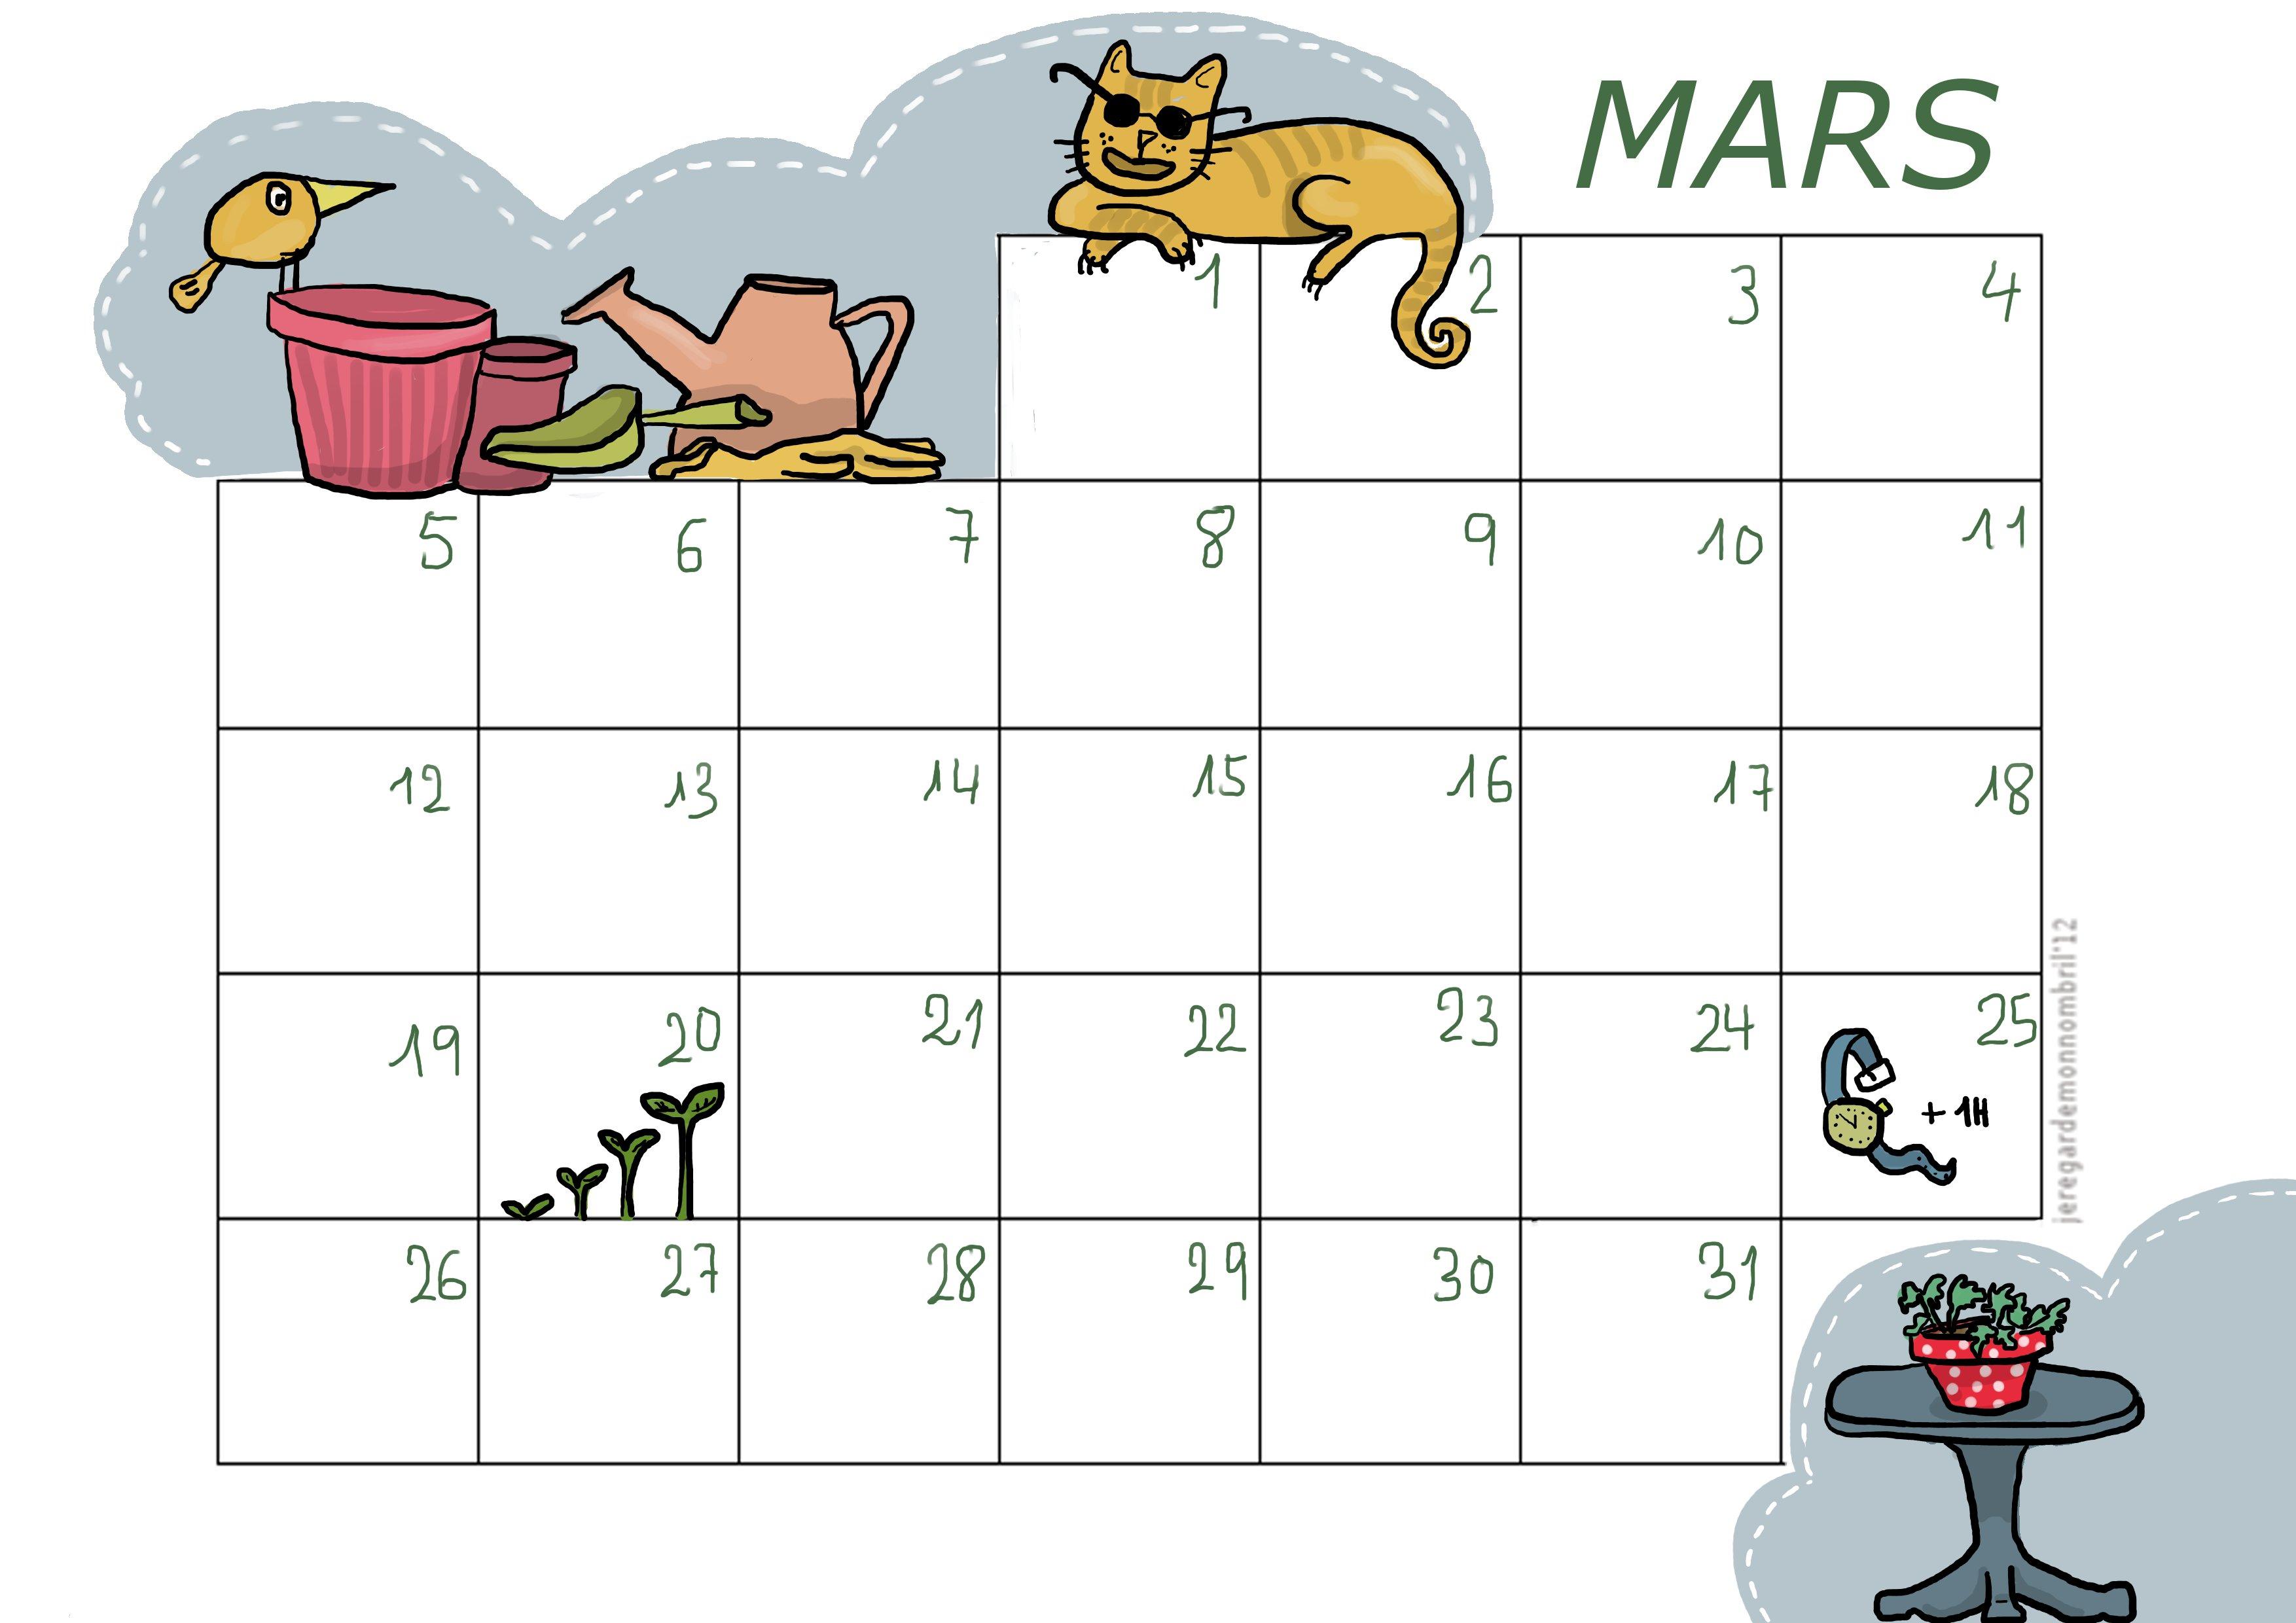 http://emmiroelmelic.free.fr/dessins/mars2012.jpg